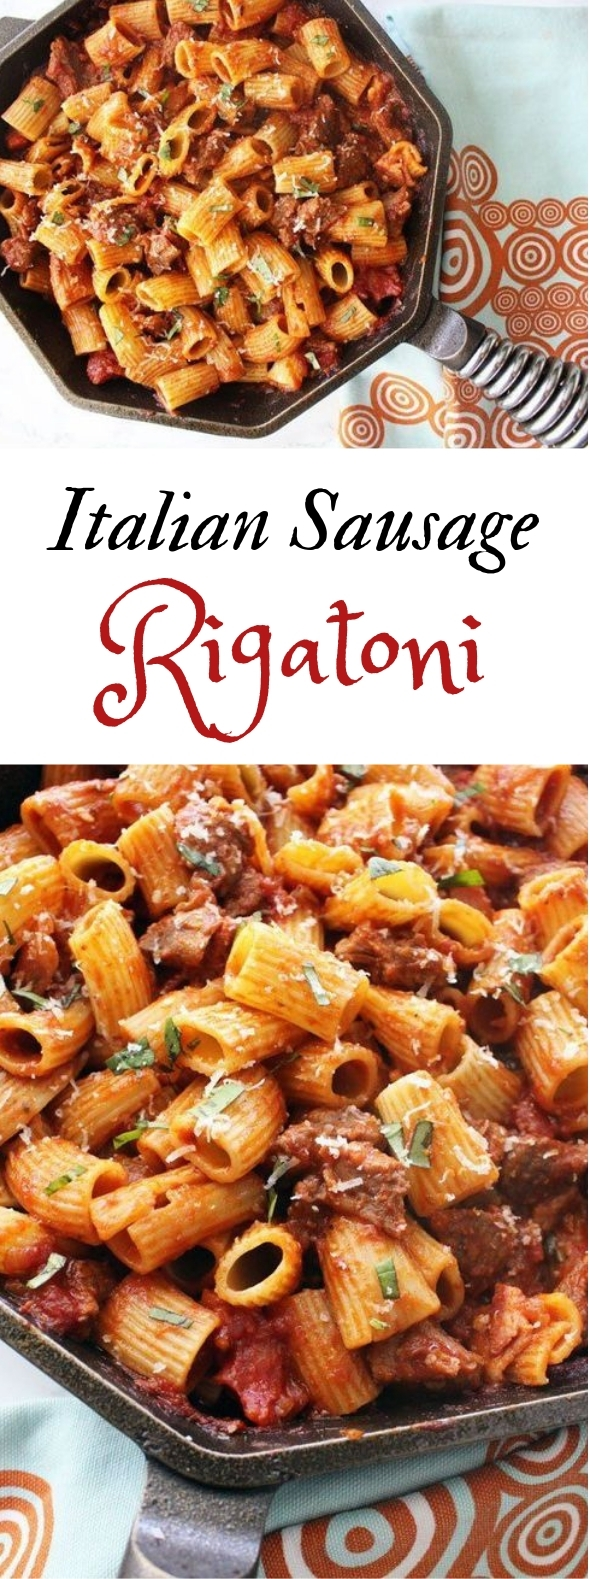 RIGATONI WITH ITALIAN SAUSAGE #pasta #dinner